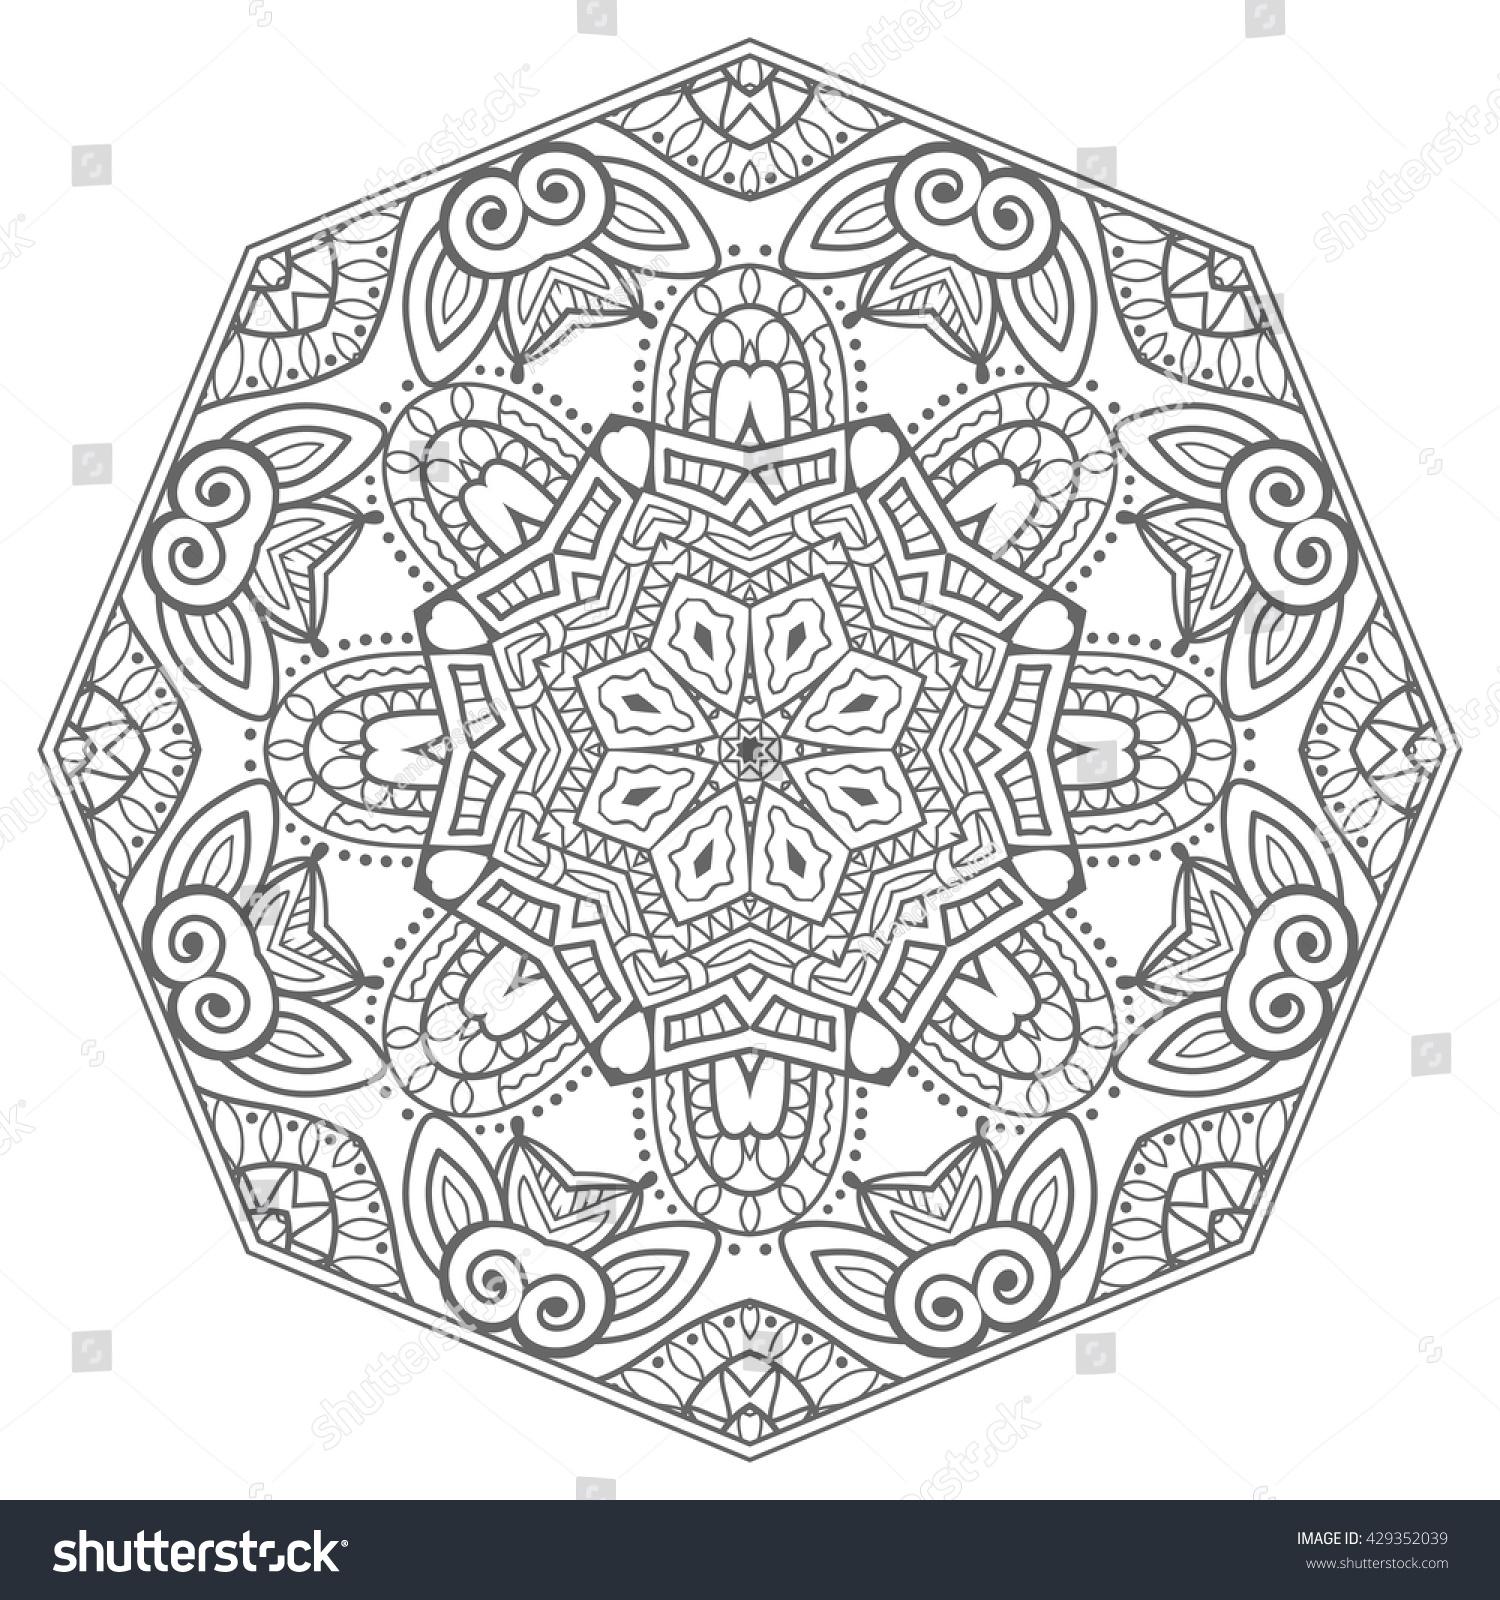 Black White Geometric Mandala Background Round Stock Vector Royalty Free 429352039